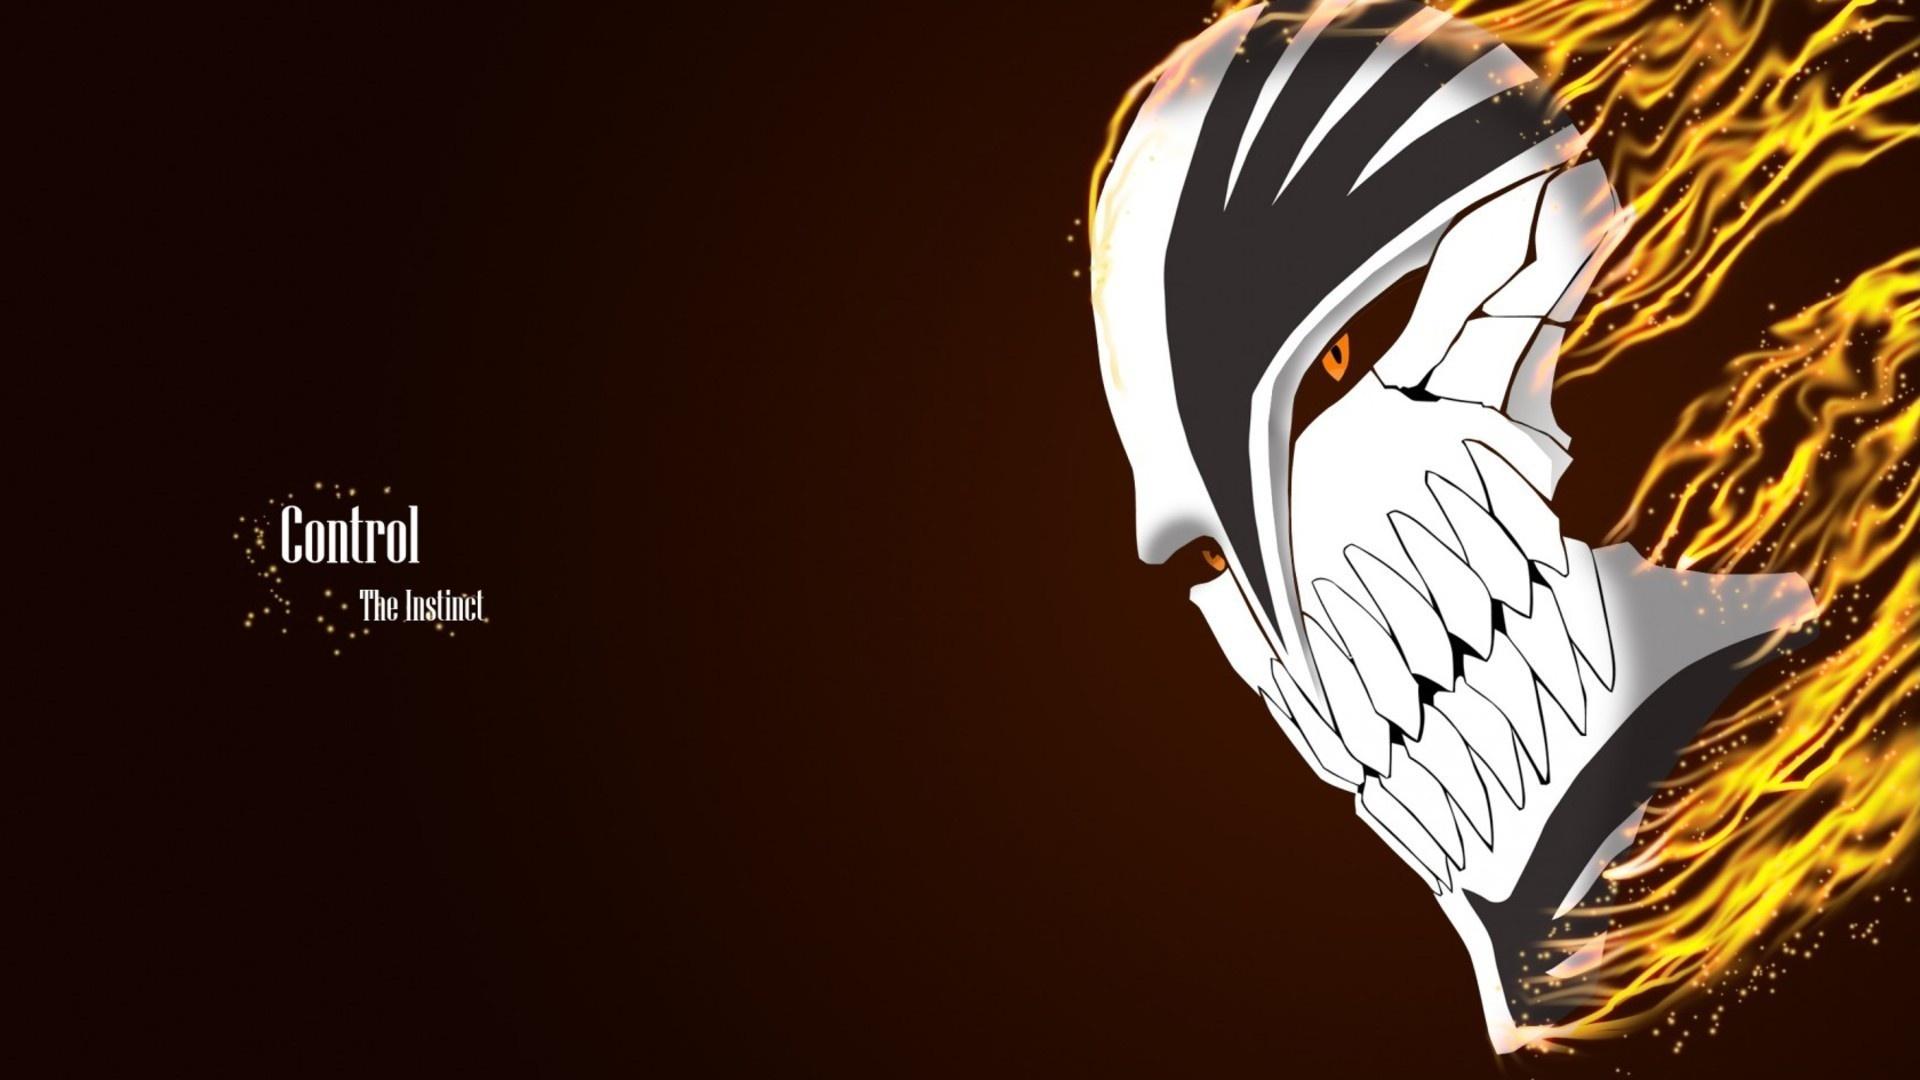 Unduh 200+ Wallpaper Hd Anime Logo HD Terbaik